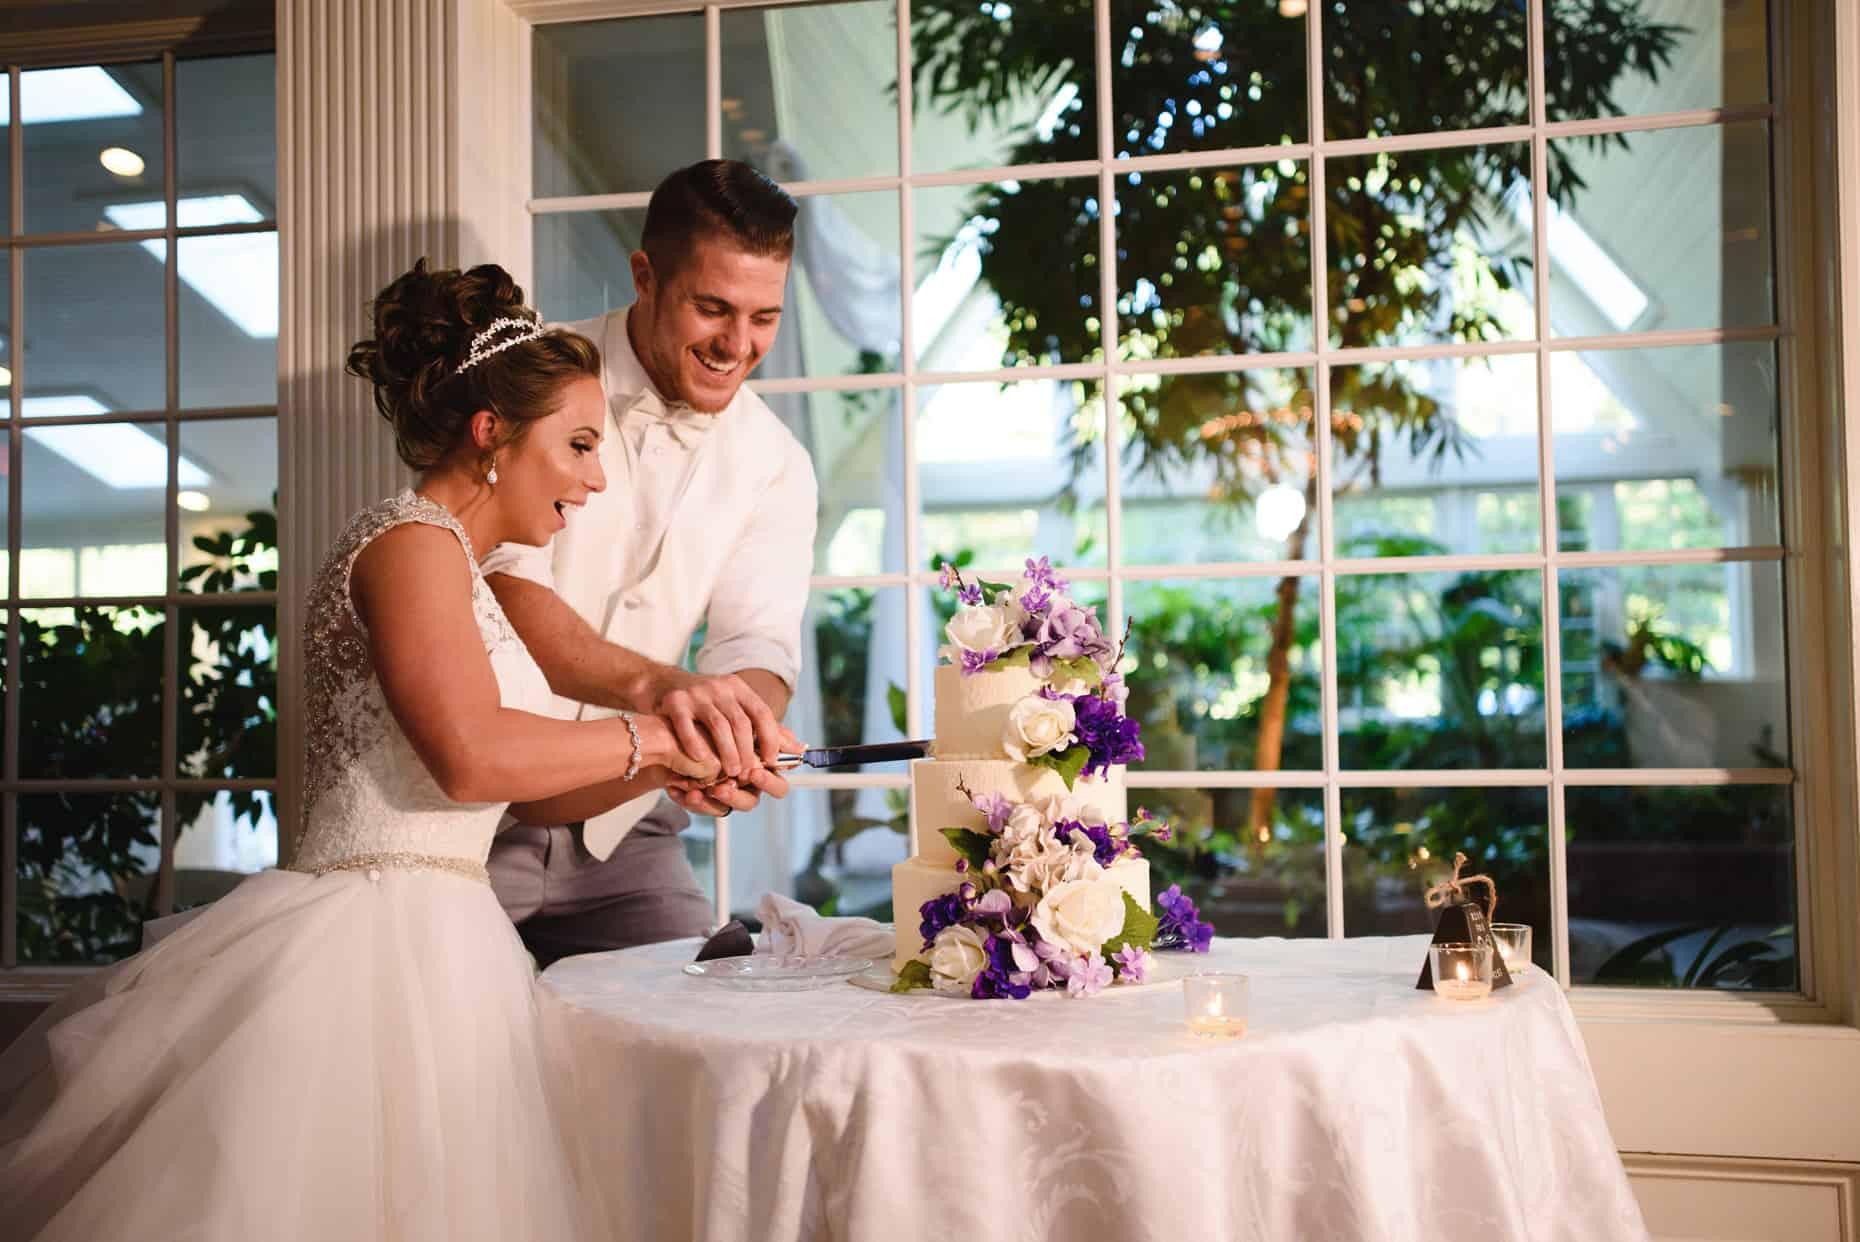 Mendenhall Inn Wedding Cake Cutting